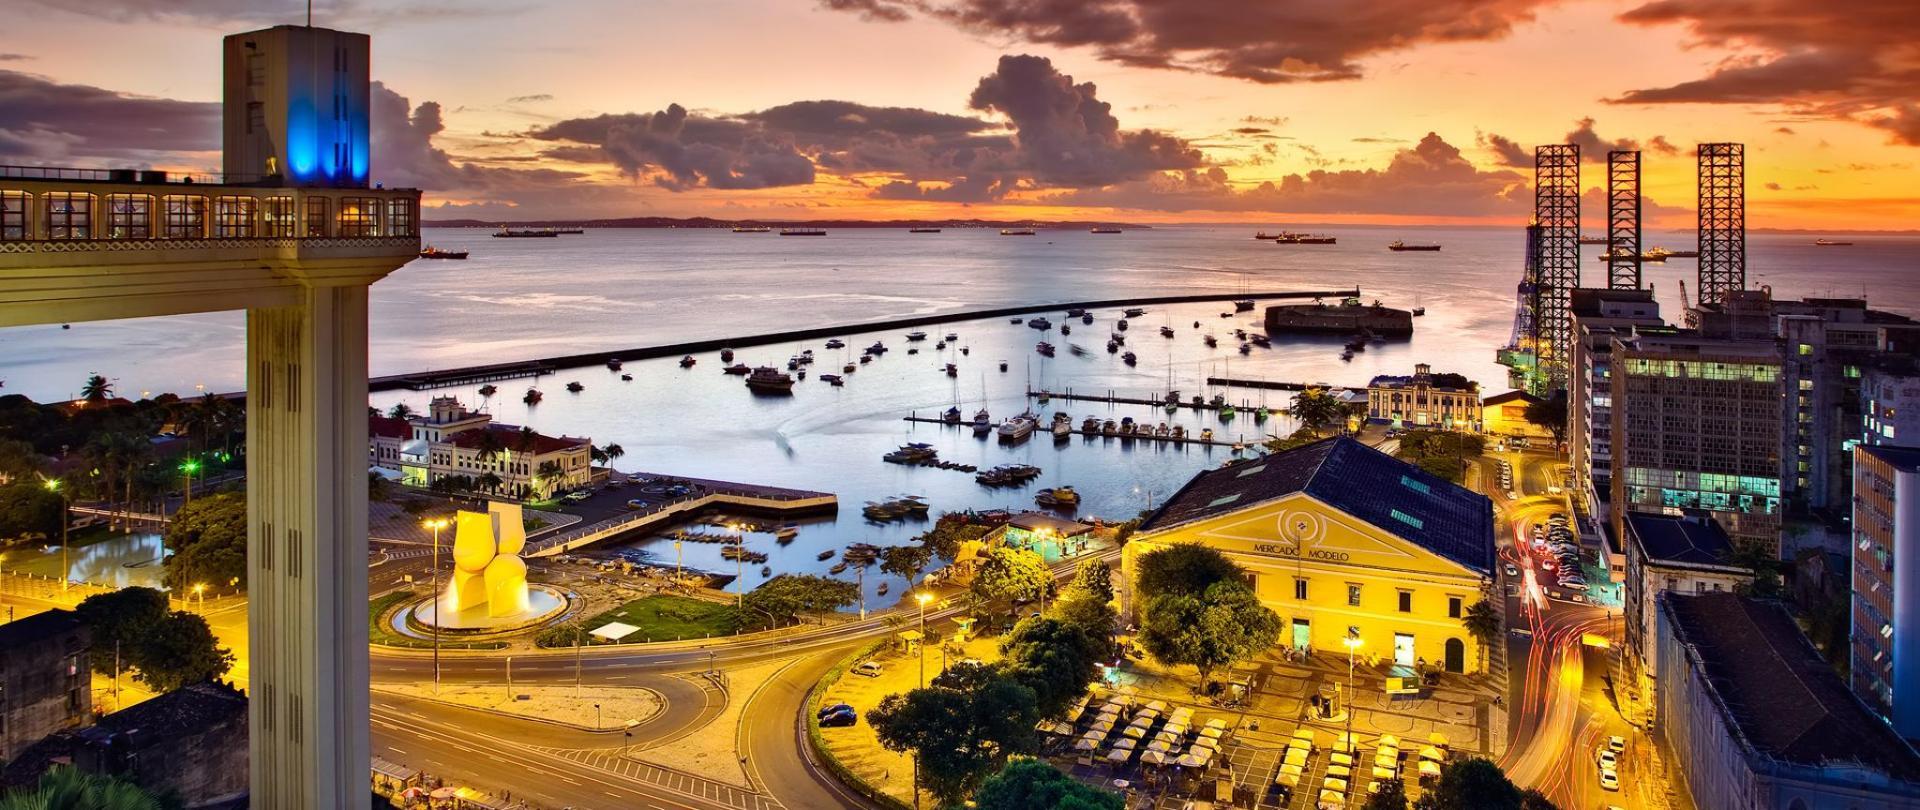 Bahia-BA-Salvador-O-01.jpg